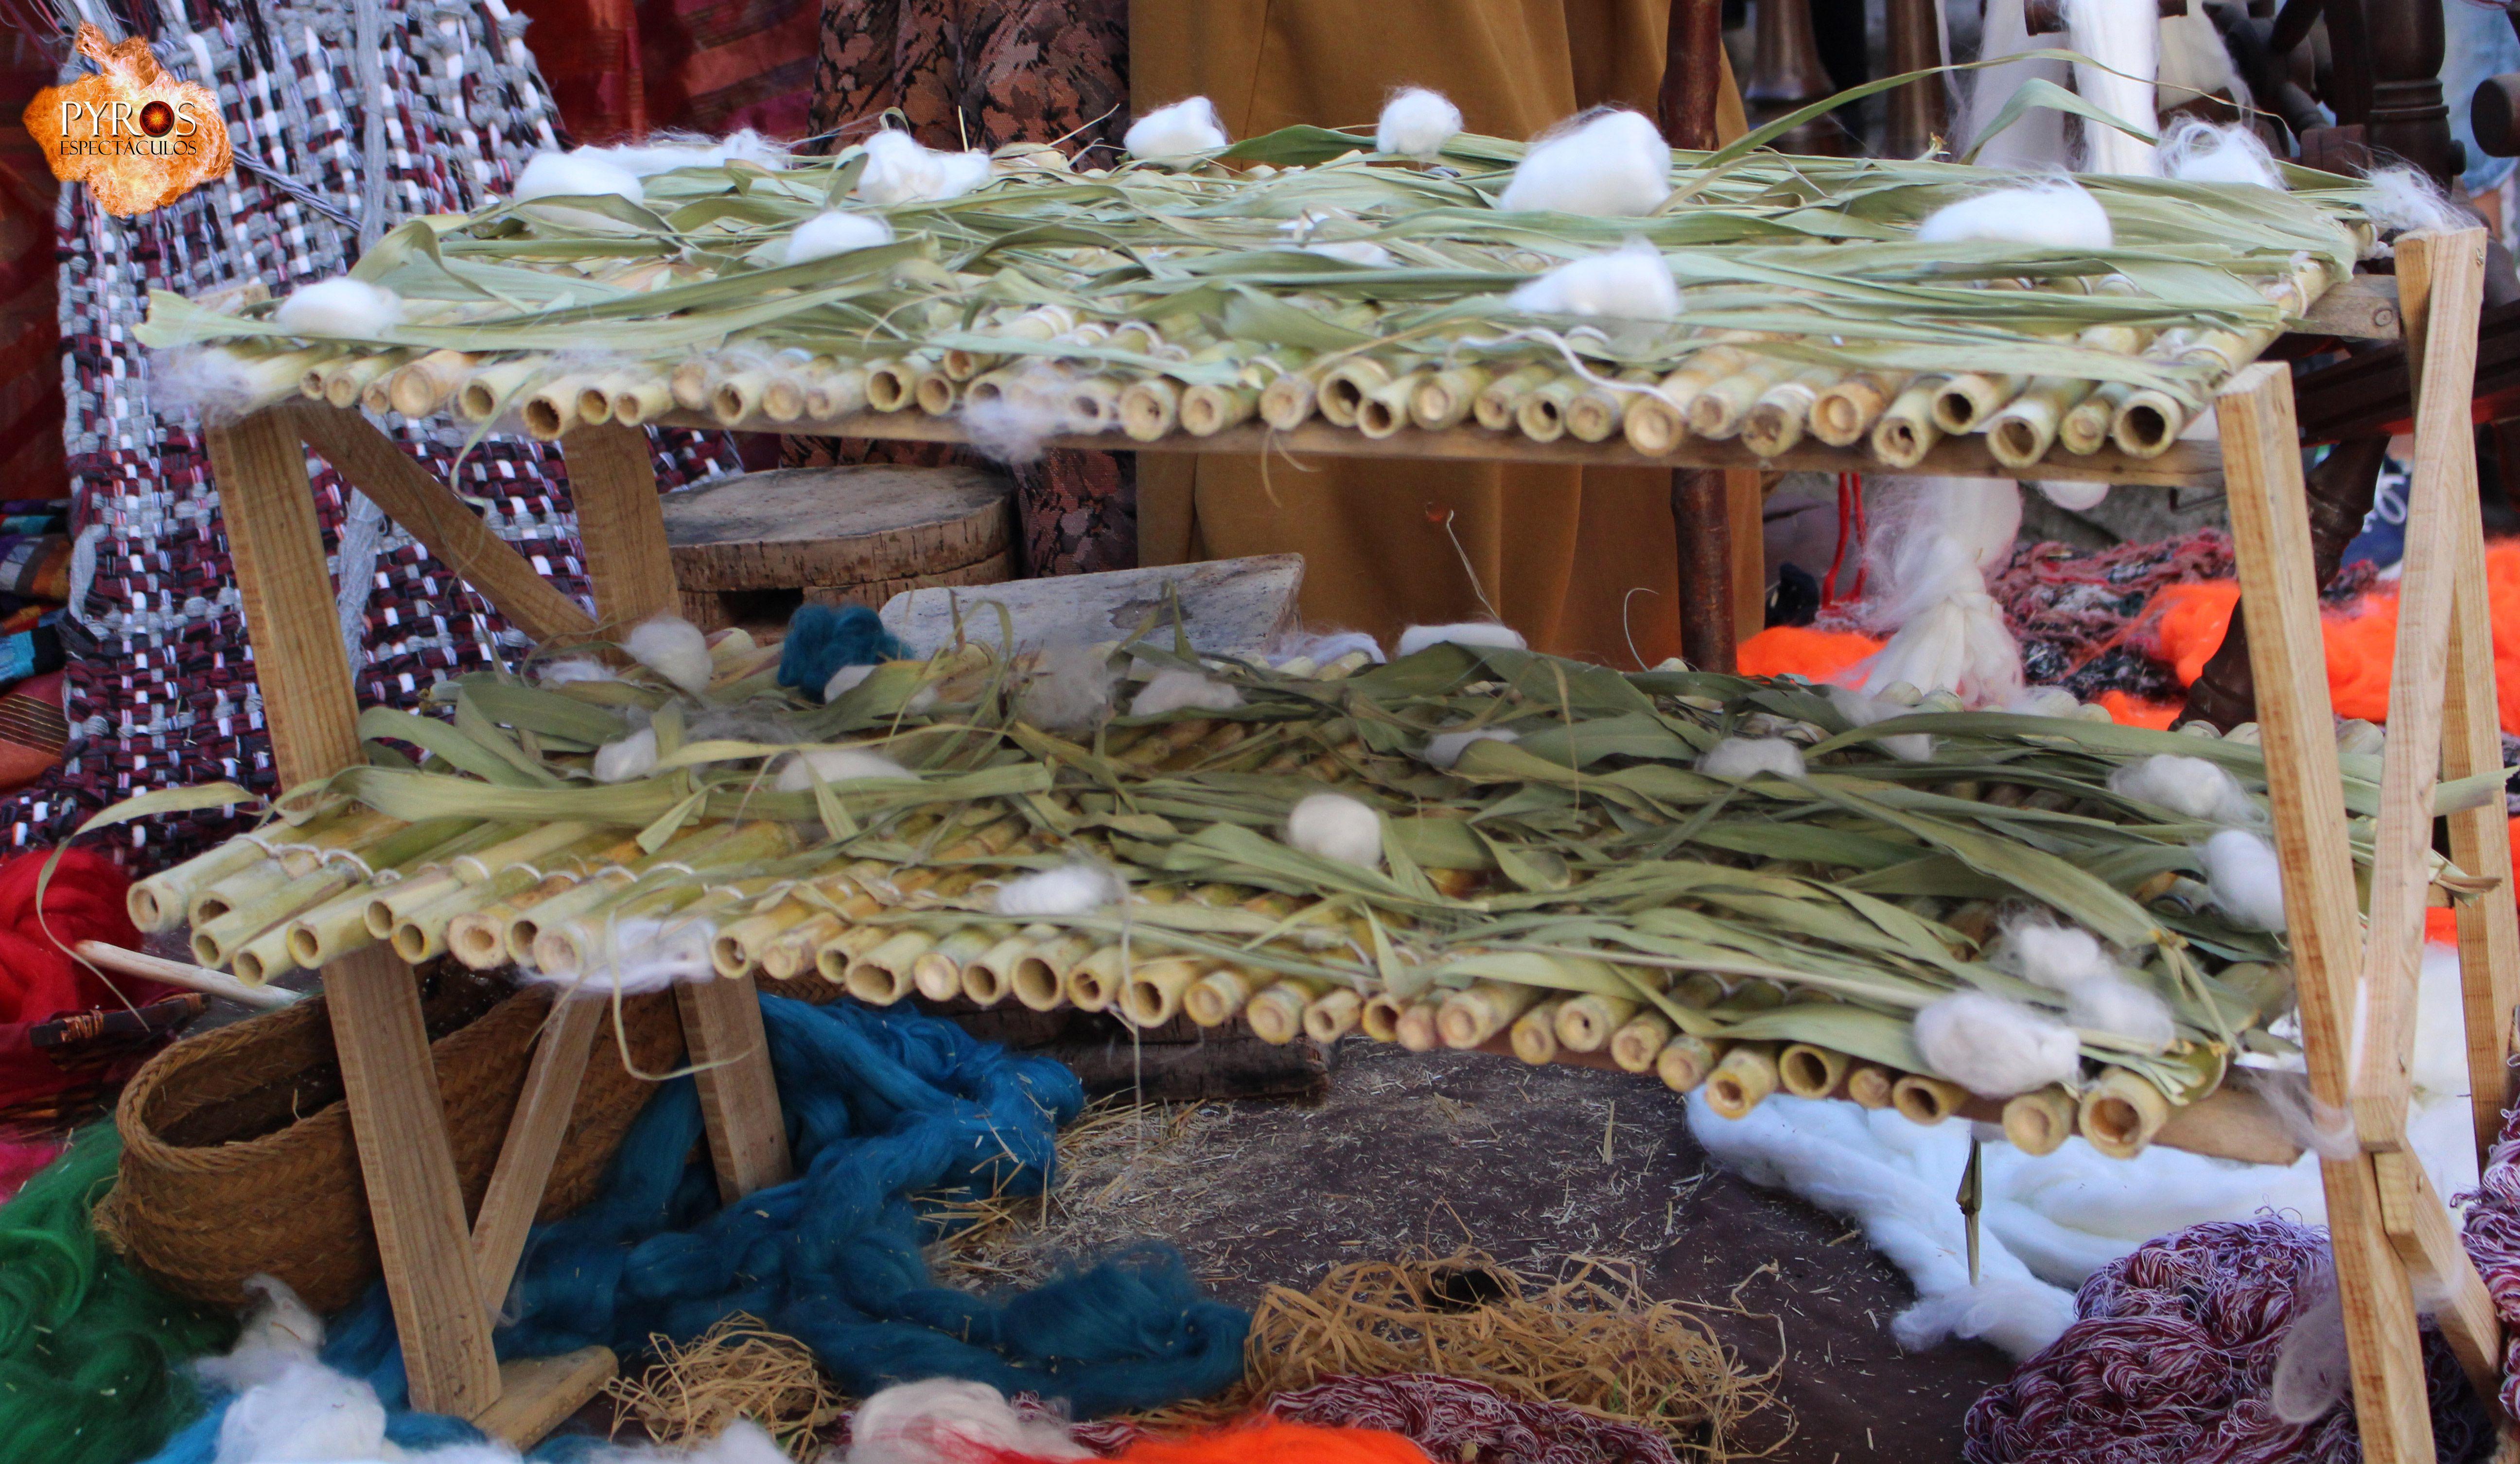 Secadero de seda / Silk dryer www.pyrosespectaculos.tk